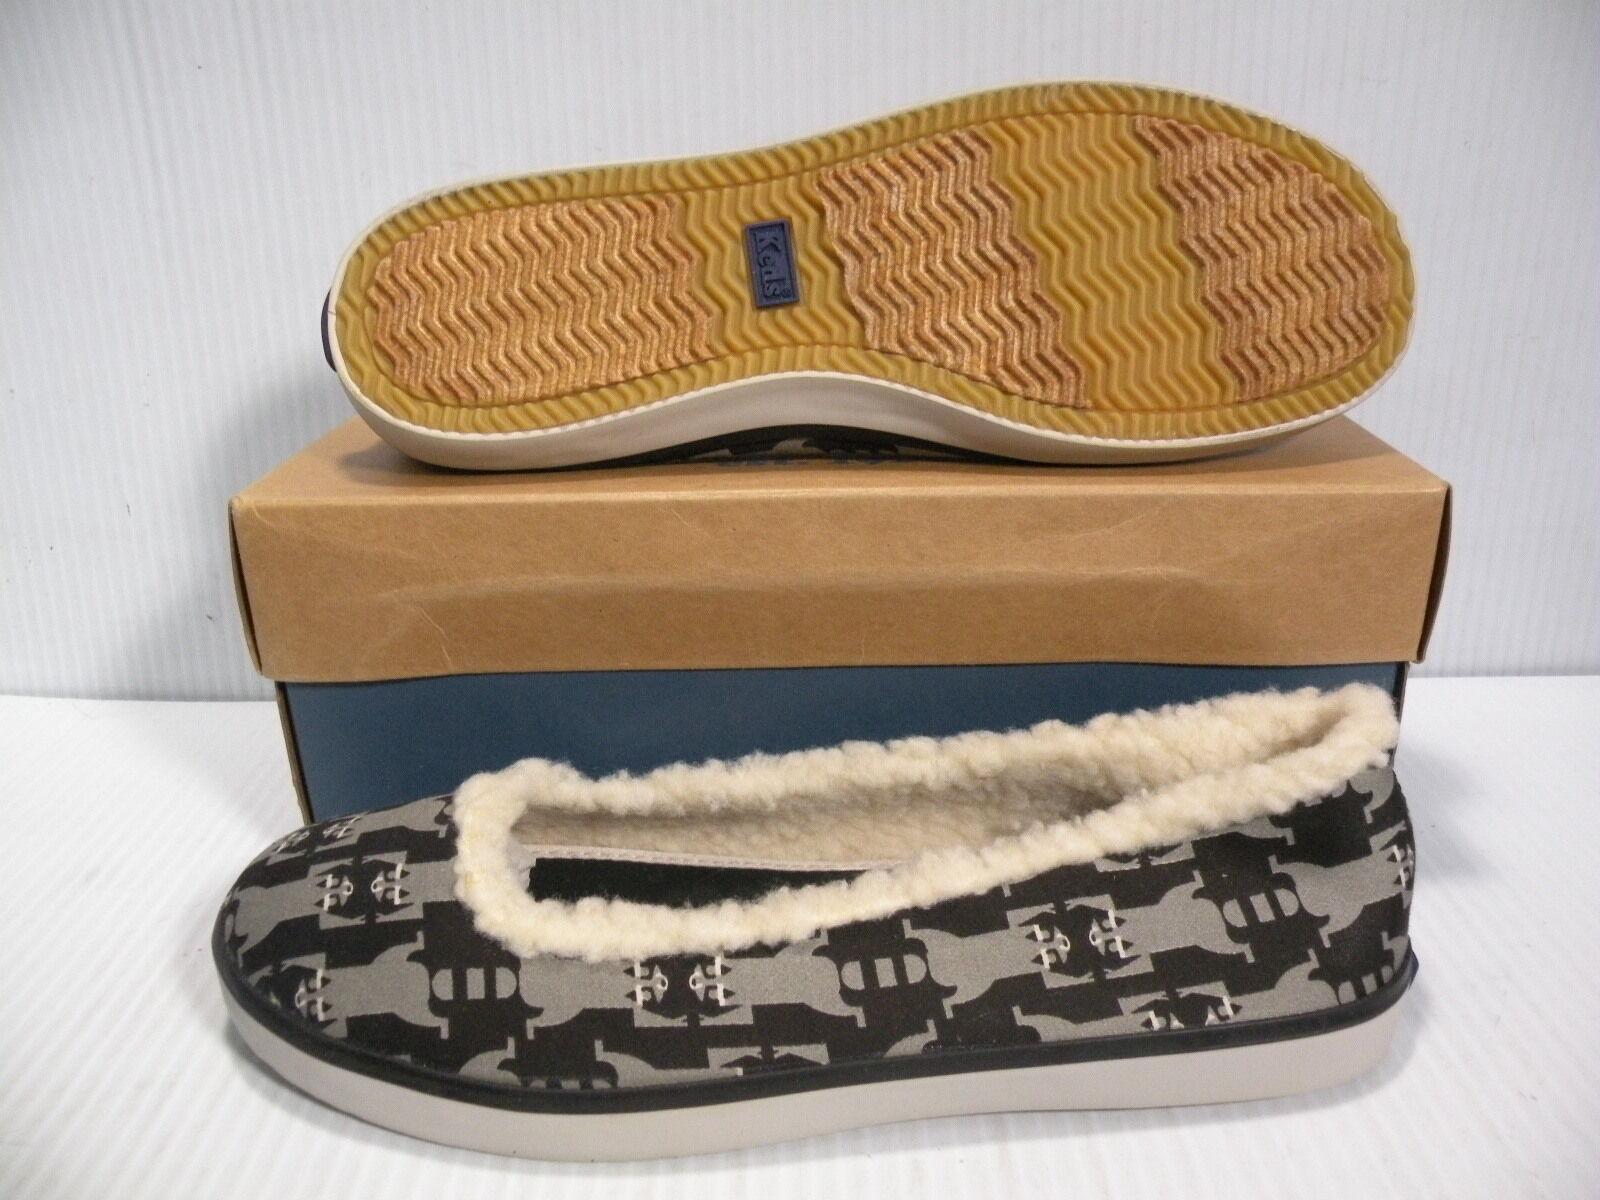 KEDS ELEANOR LOW WOMEN Schuhe BLACK RACOON WF19841 SIZE 8 NEW